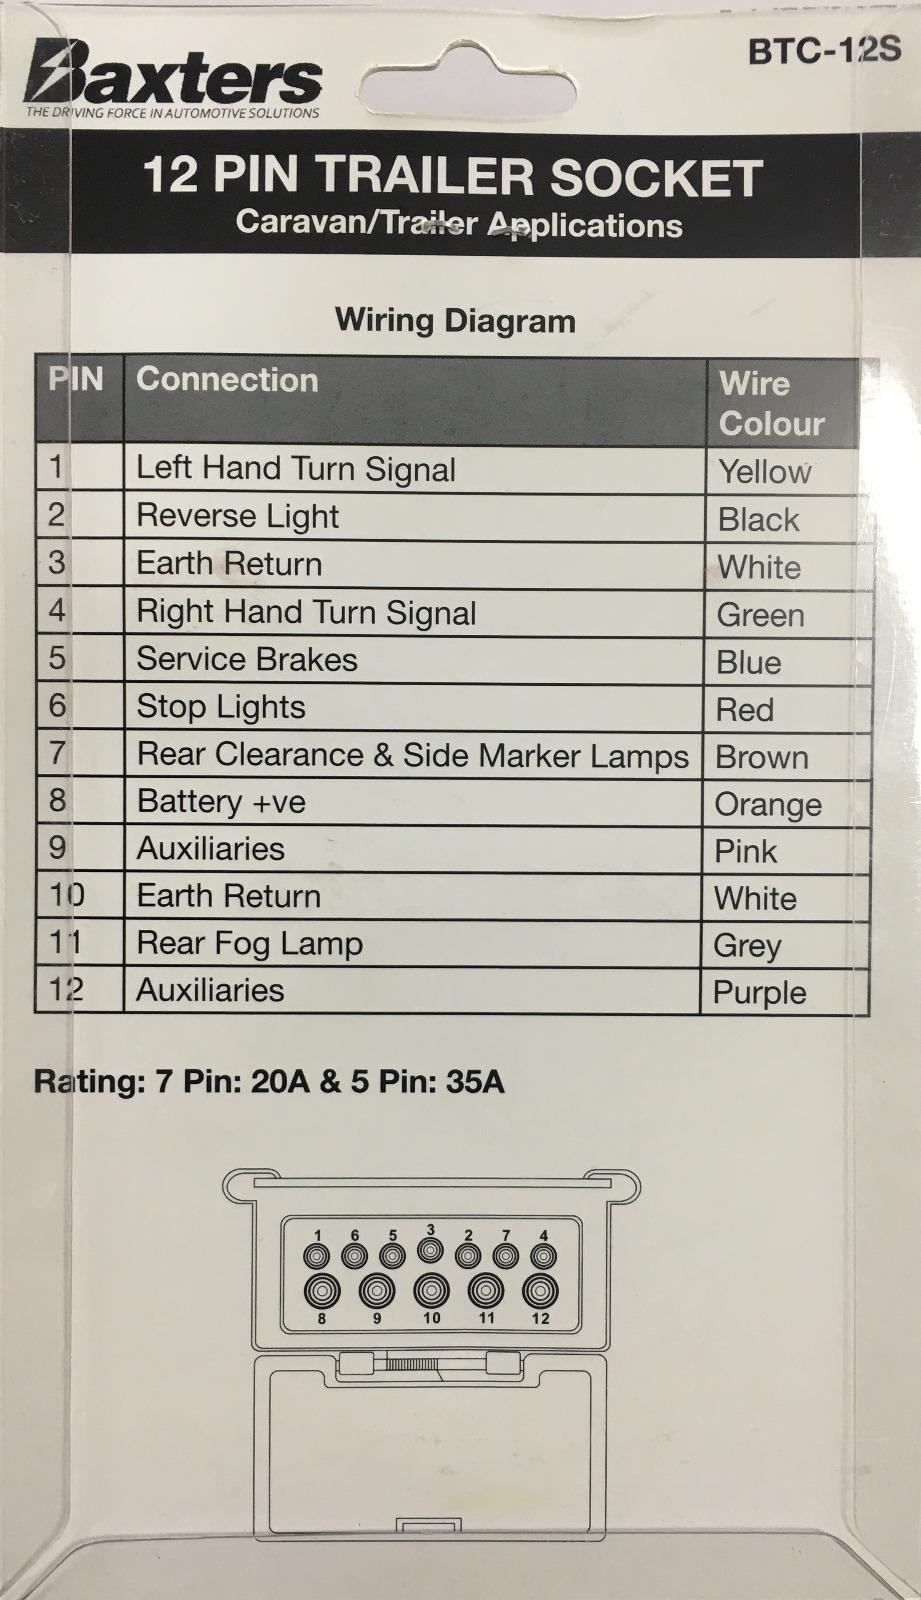 medium resolution of britax 12 pin trailer plug wiring diagram britax btc 12p 6 btc 12s